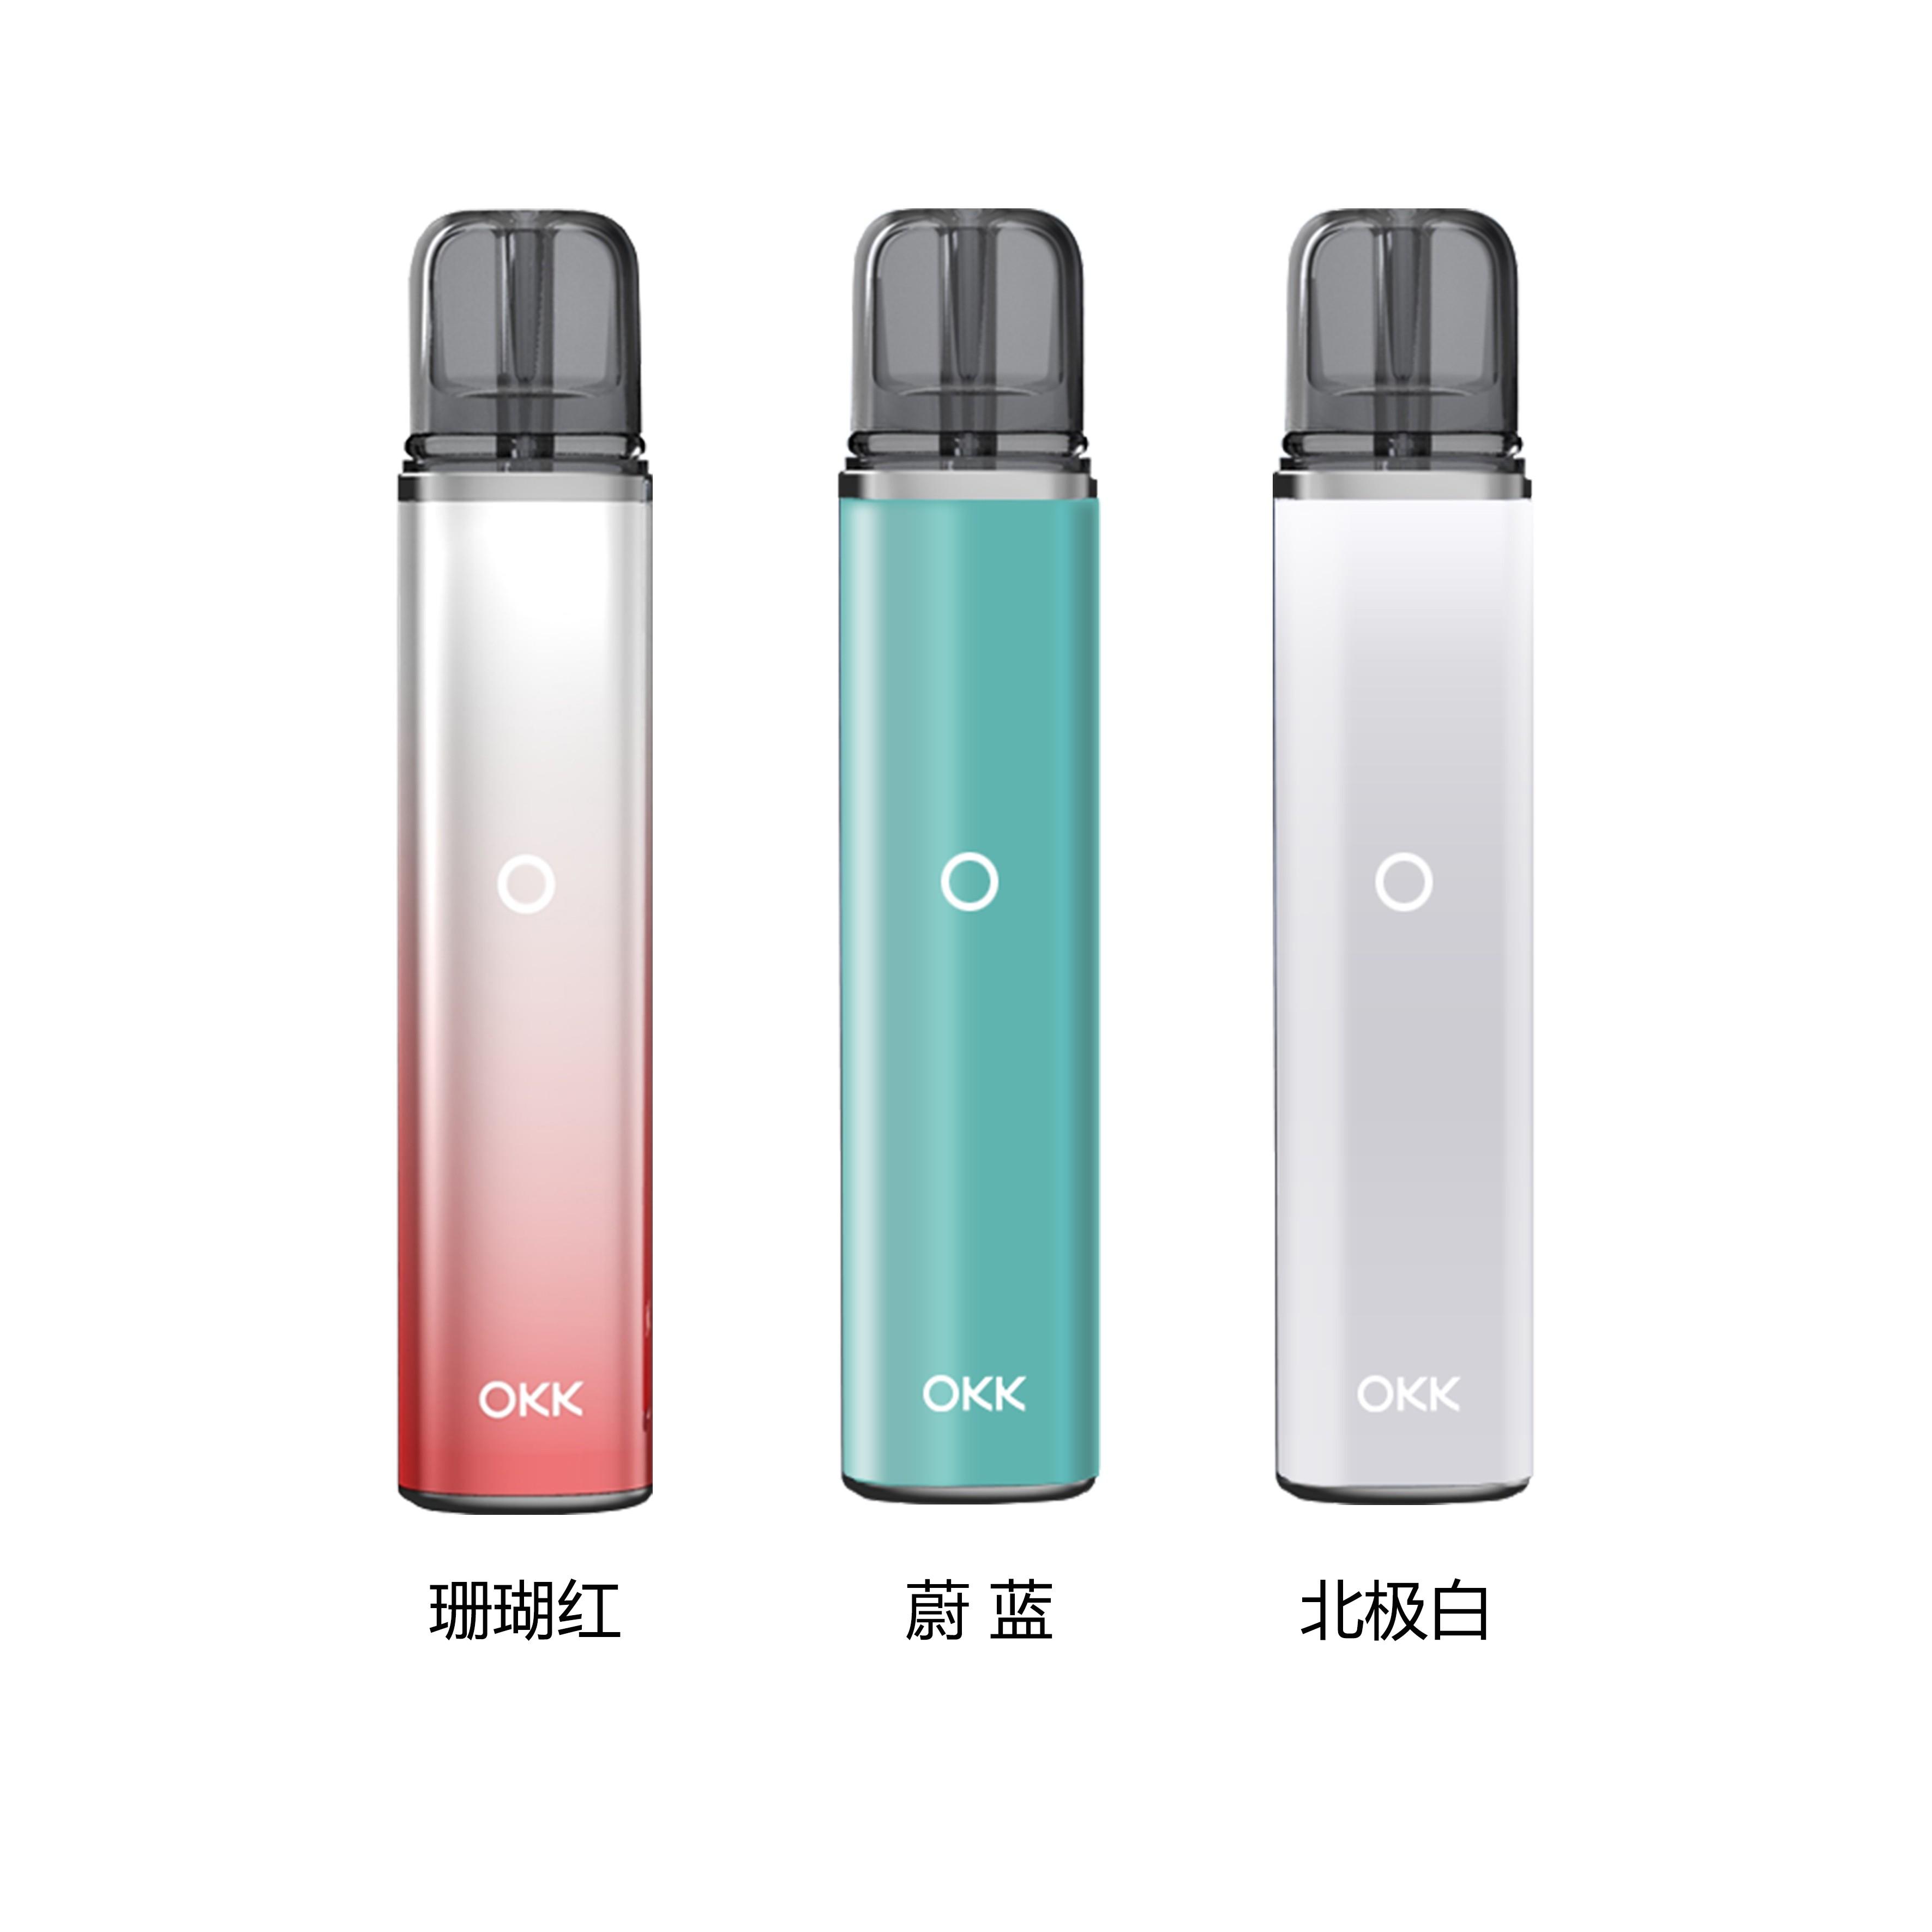 OKK坚持研发高品质的智能雾化器